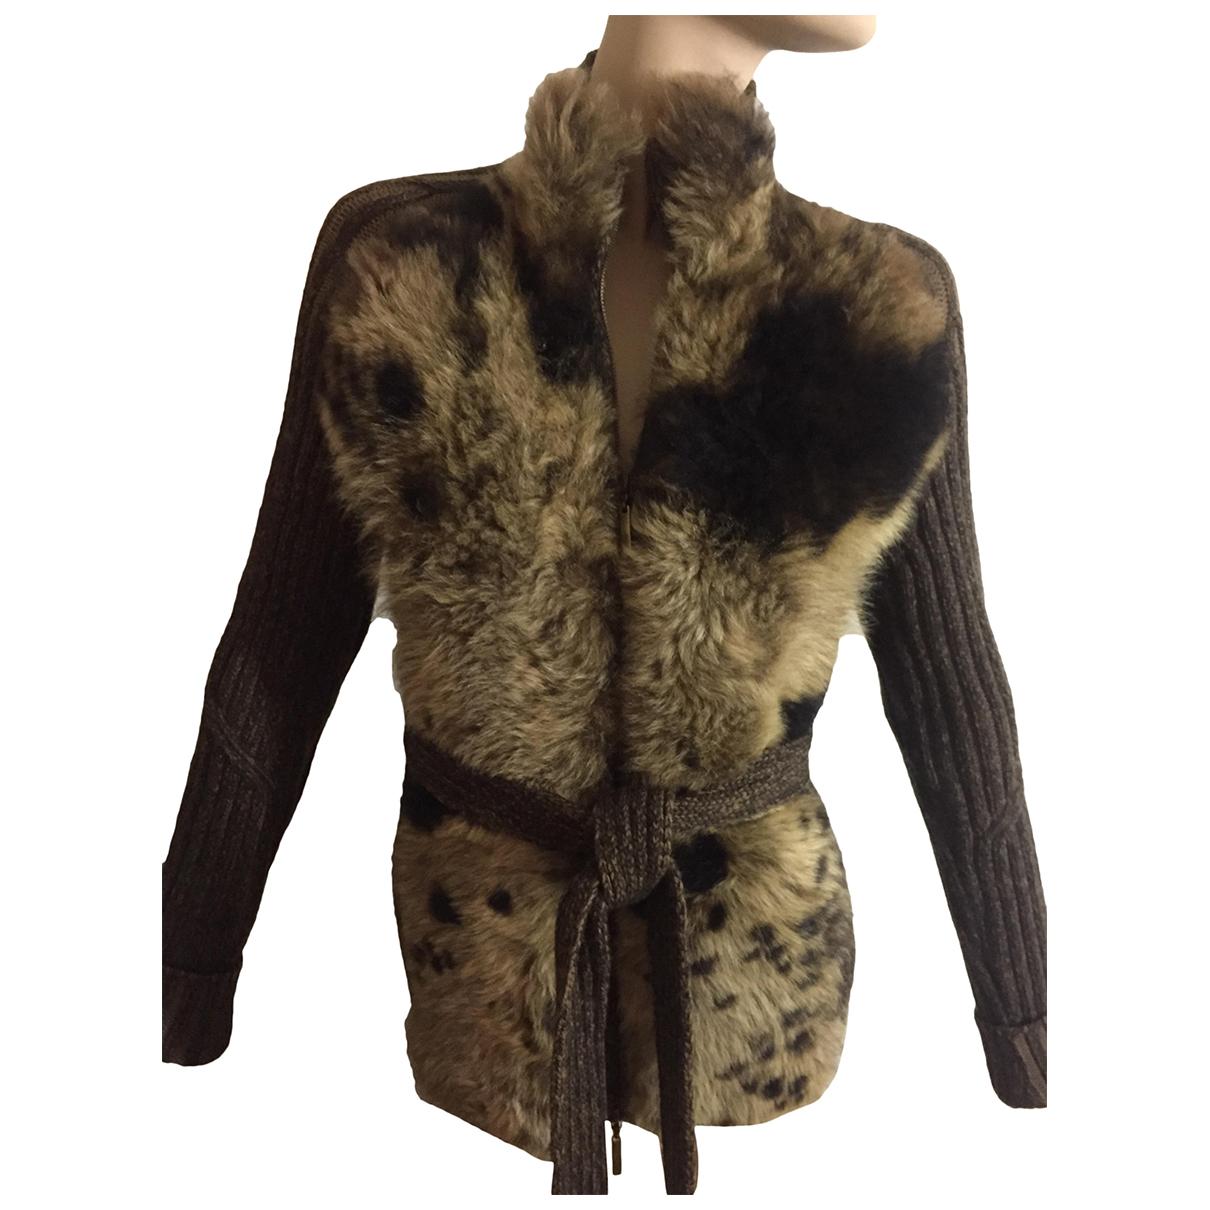 Roberto Cavalli N Brown Wool Knitwear for Women XS International